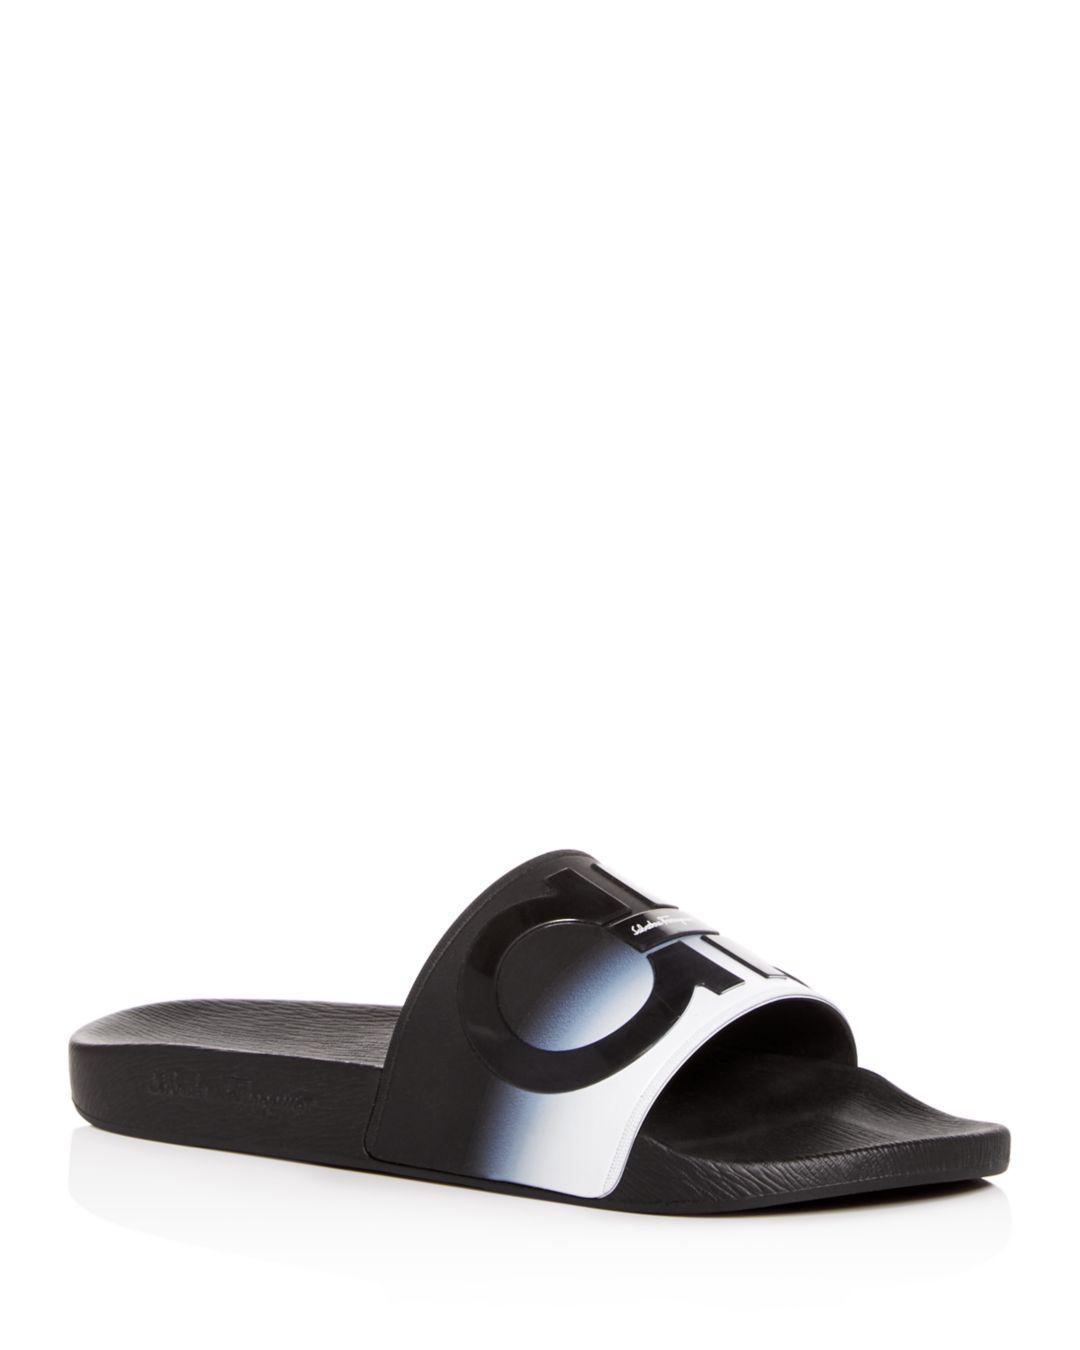 5f5ceaac1f0d Ferragamo Men s Groove Slide Sandals in Black for Men - Lyst